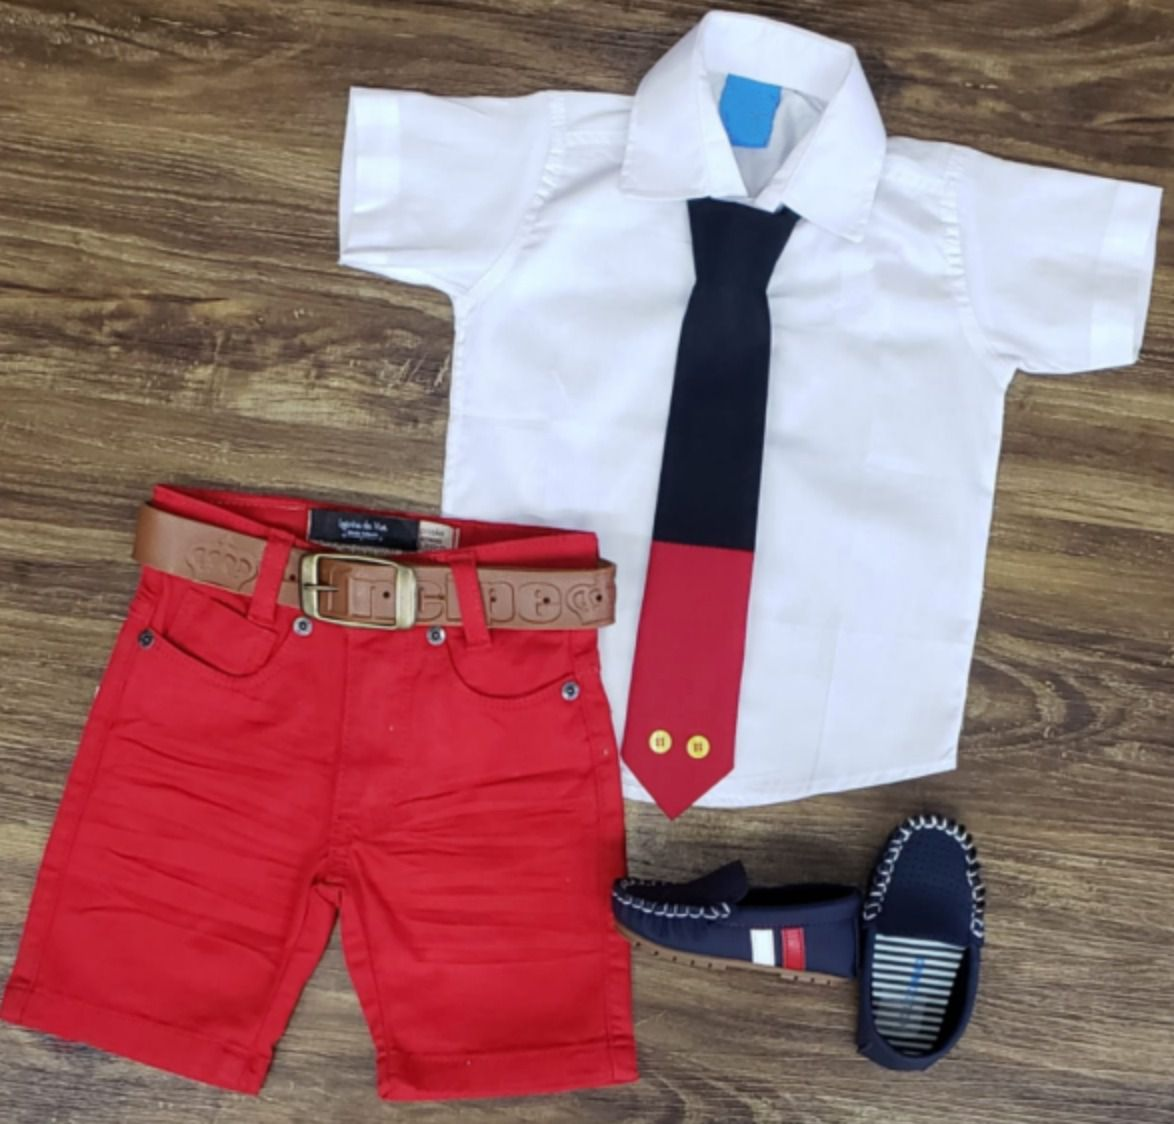 Bermuda Vermelha com Camisa e Gravata - Look Mickey